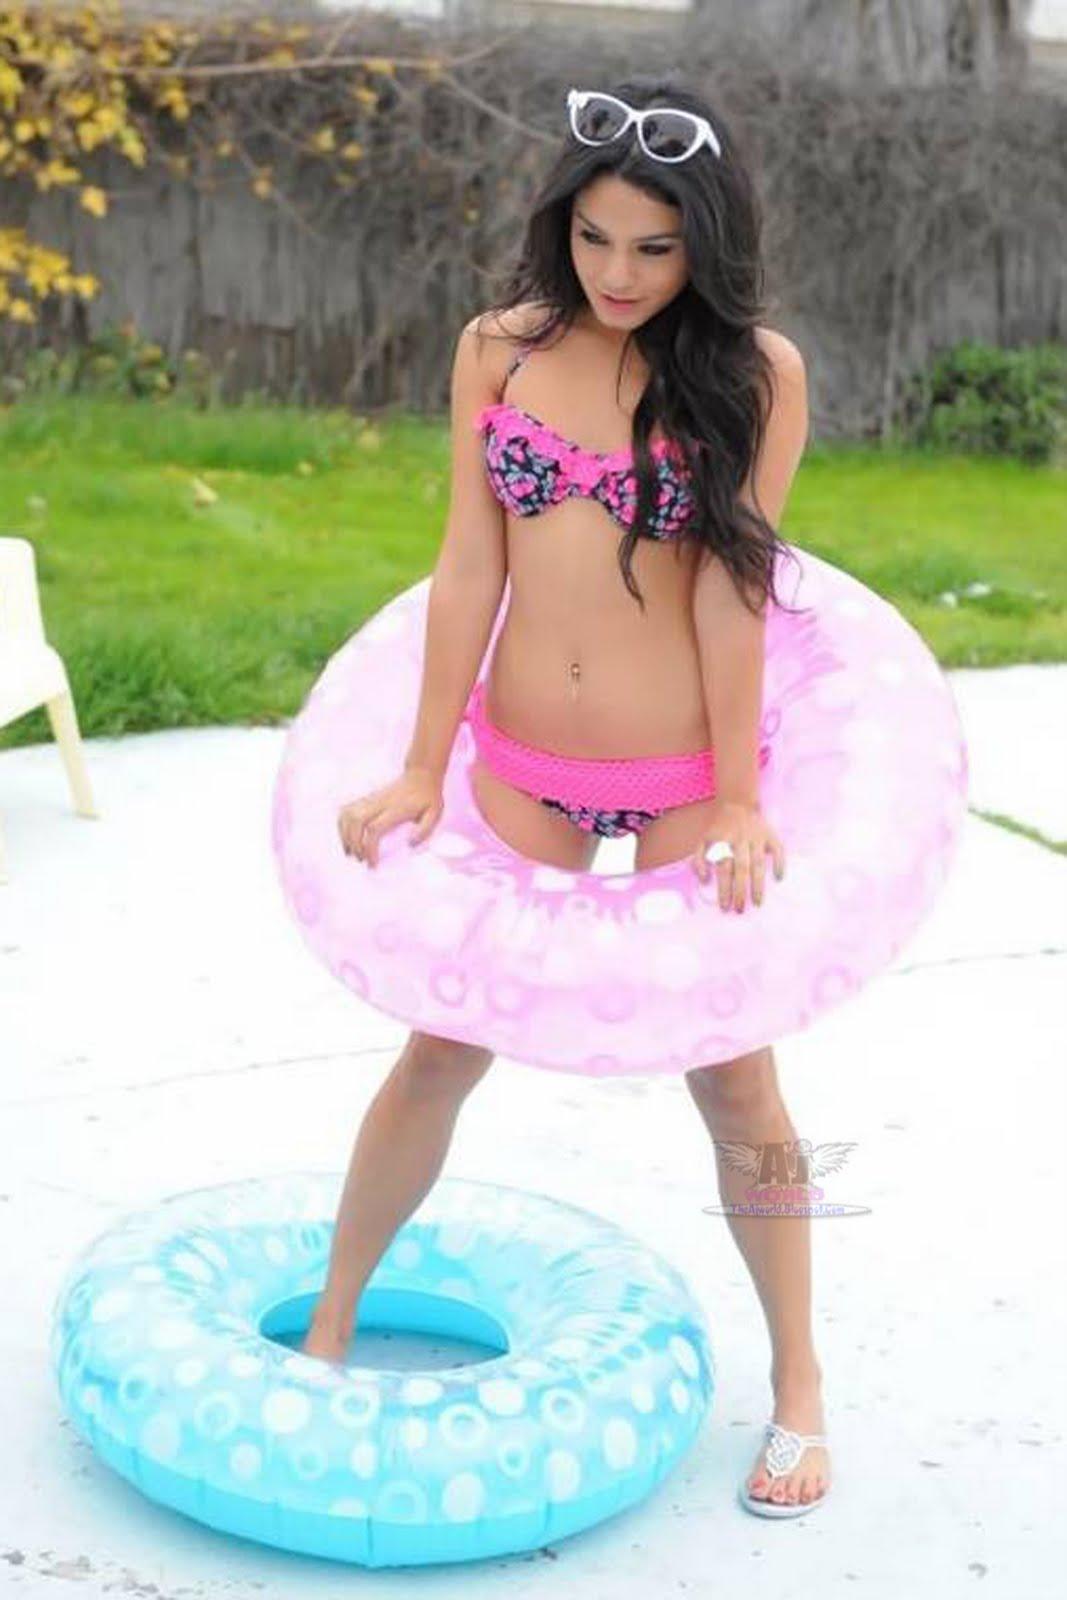 http://2.bp.blogspot.com/-Bwy7K3JvEHE/Td0q2FRU7DI/AAAAAAAAAWI/pgdsd3YsOXk/s1600/Vanessa+Hudgens+Latest+Unseen+Photos+In+Bikini+2011+-+theajworld.blogspot.com+%25284%2529.jpg